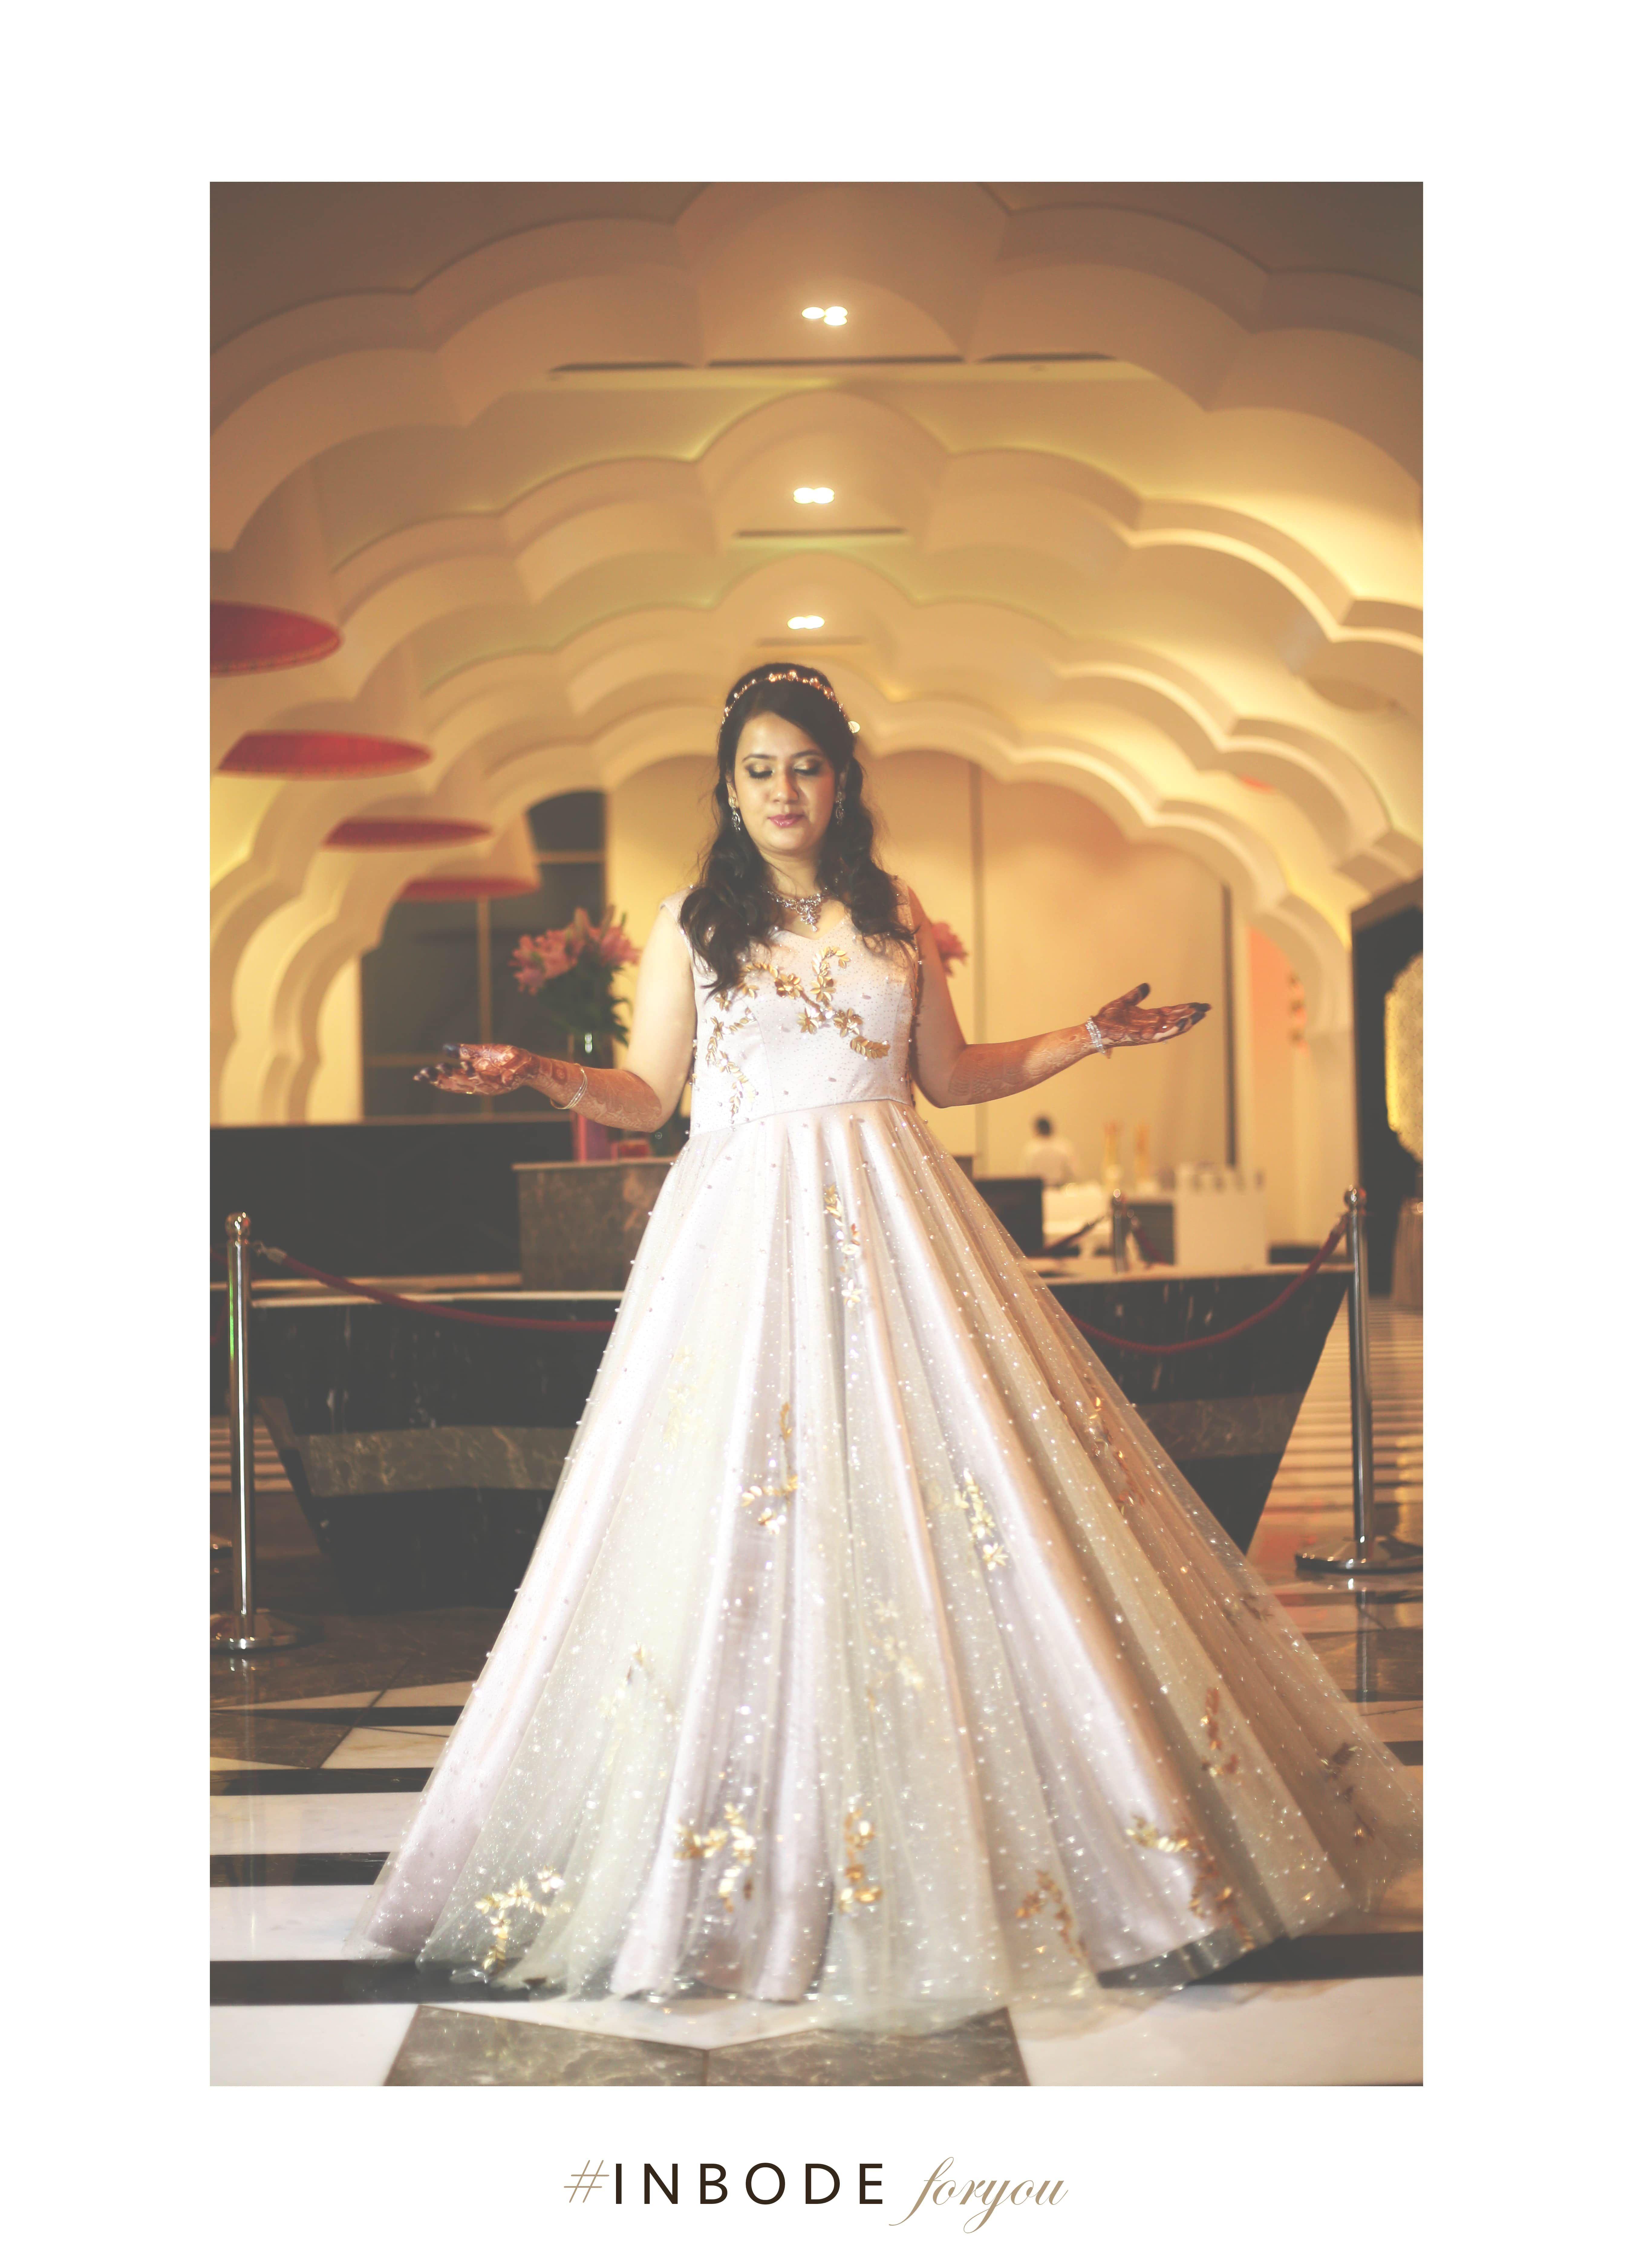 Minimal bridal outfit! Perfect for ball themes! #minimal brides #westernbride #odernbrides #wedmegood #bridal #bridesmaid #photography #weddingphotography #inbode #inbodeforyou